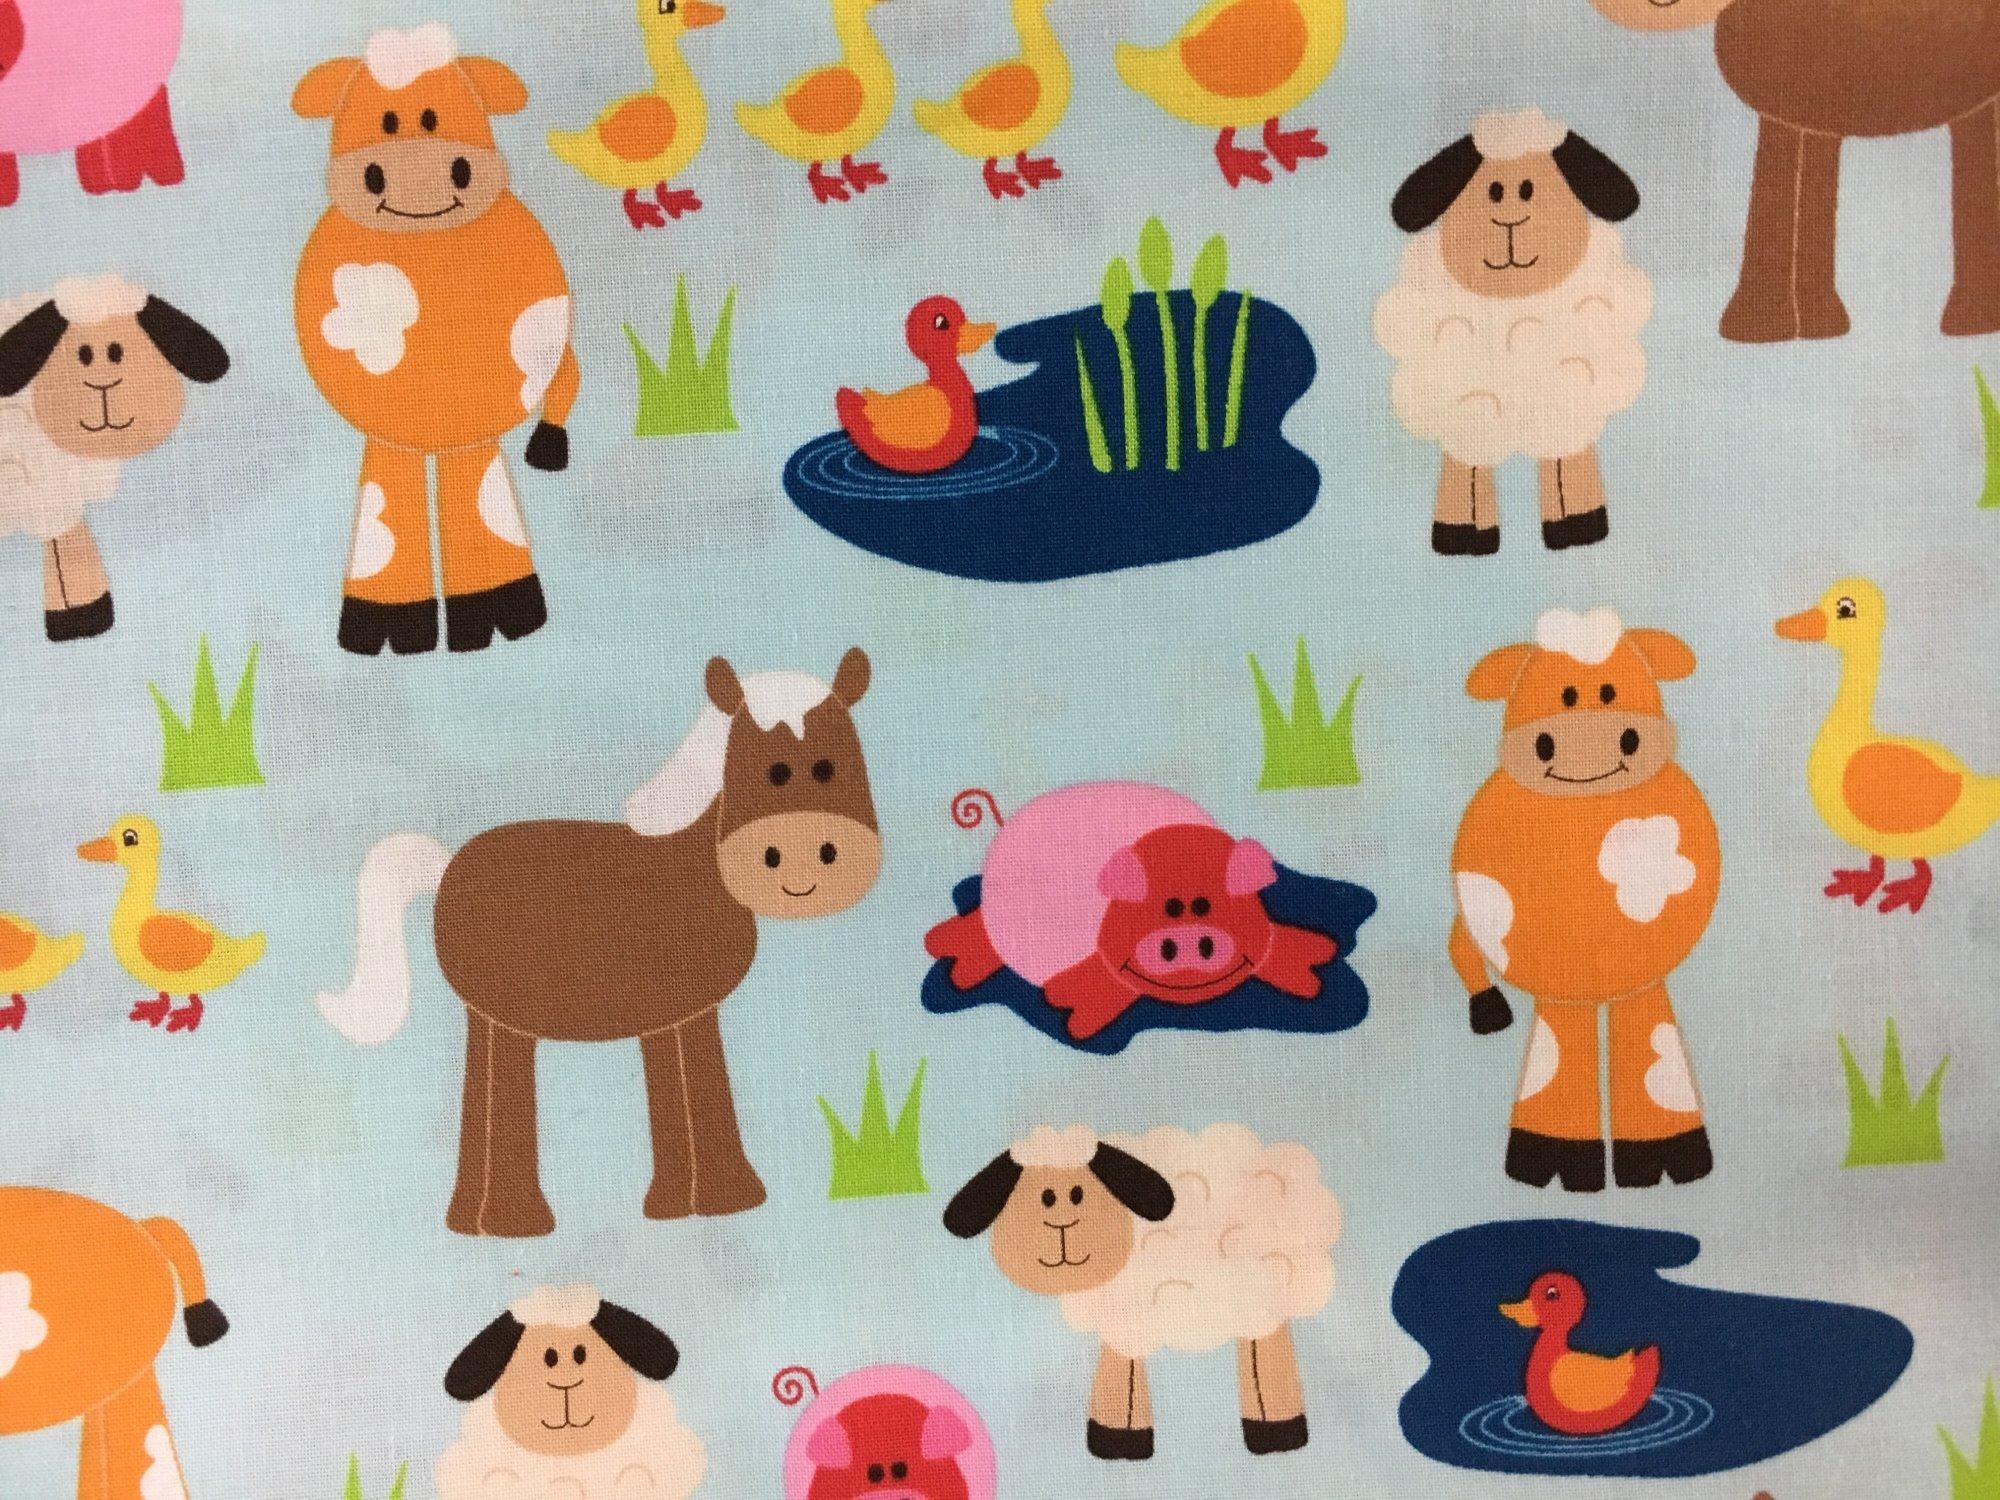 RJR; Apple Hill Farm - animals